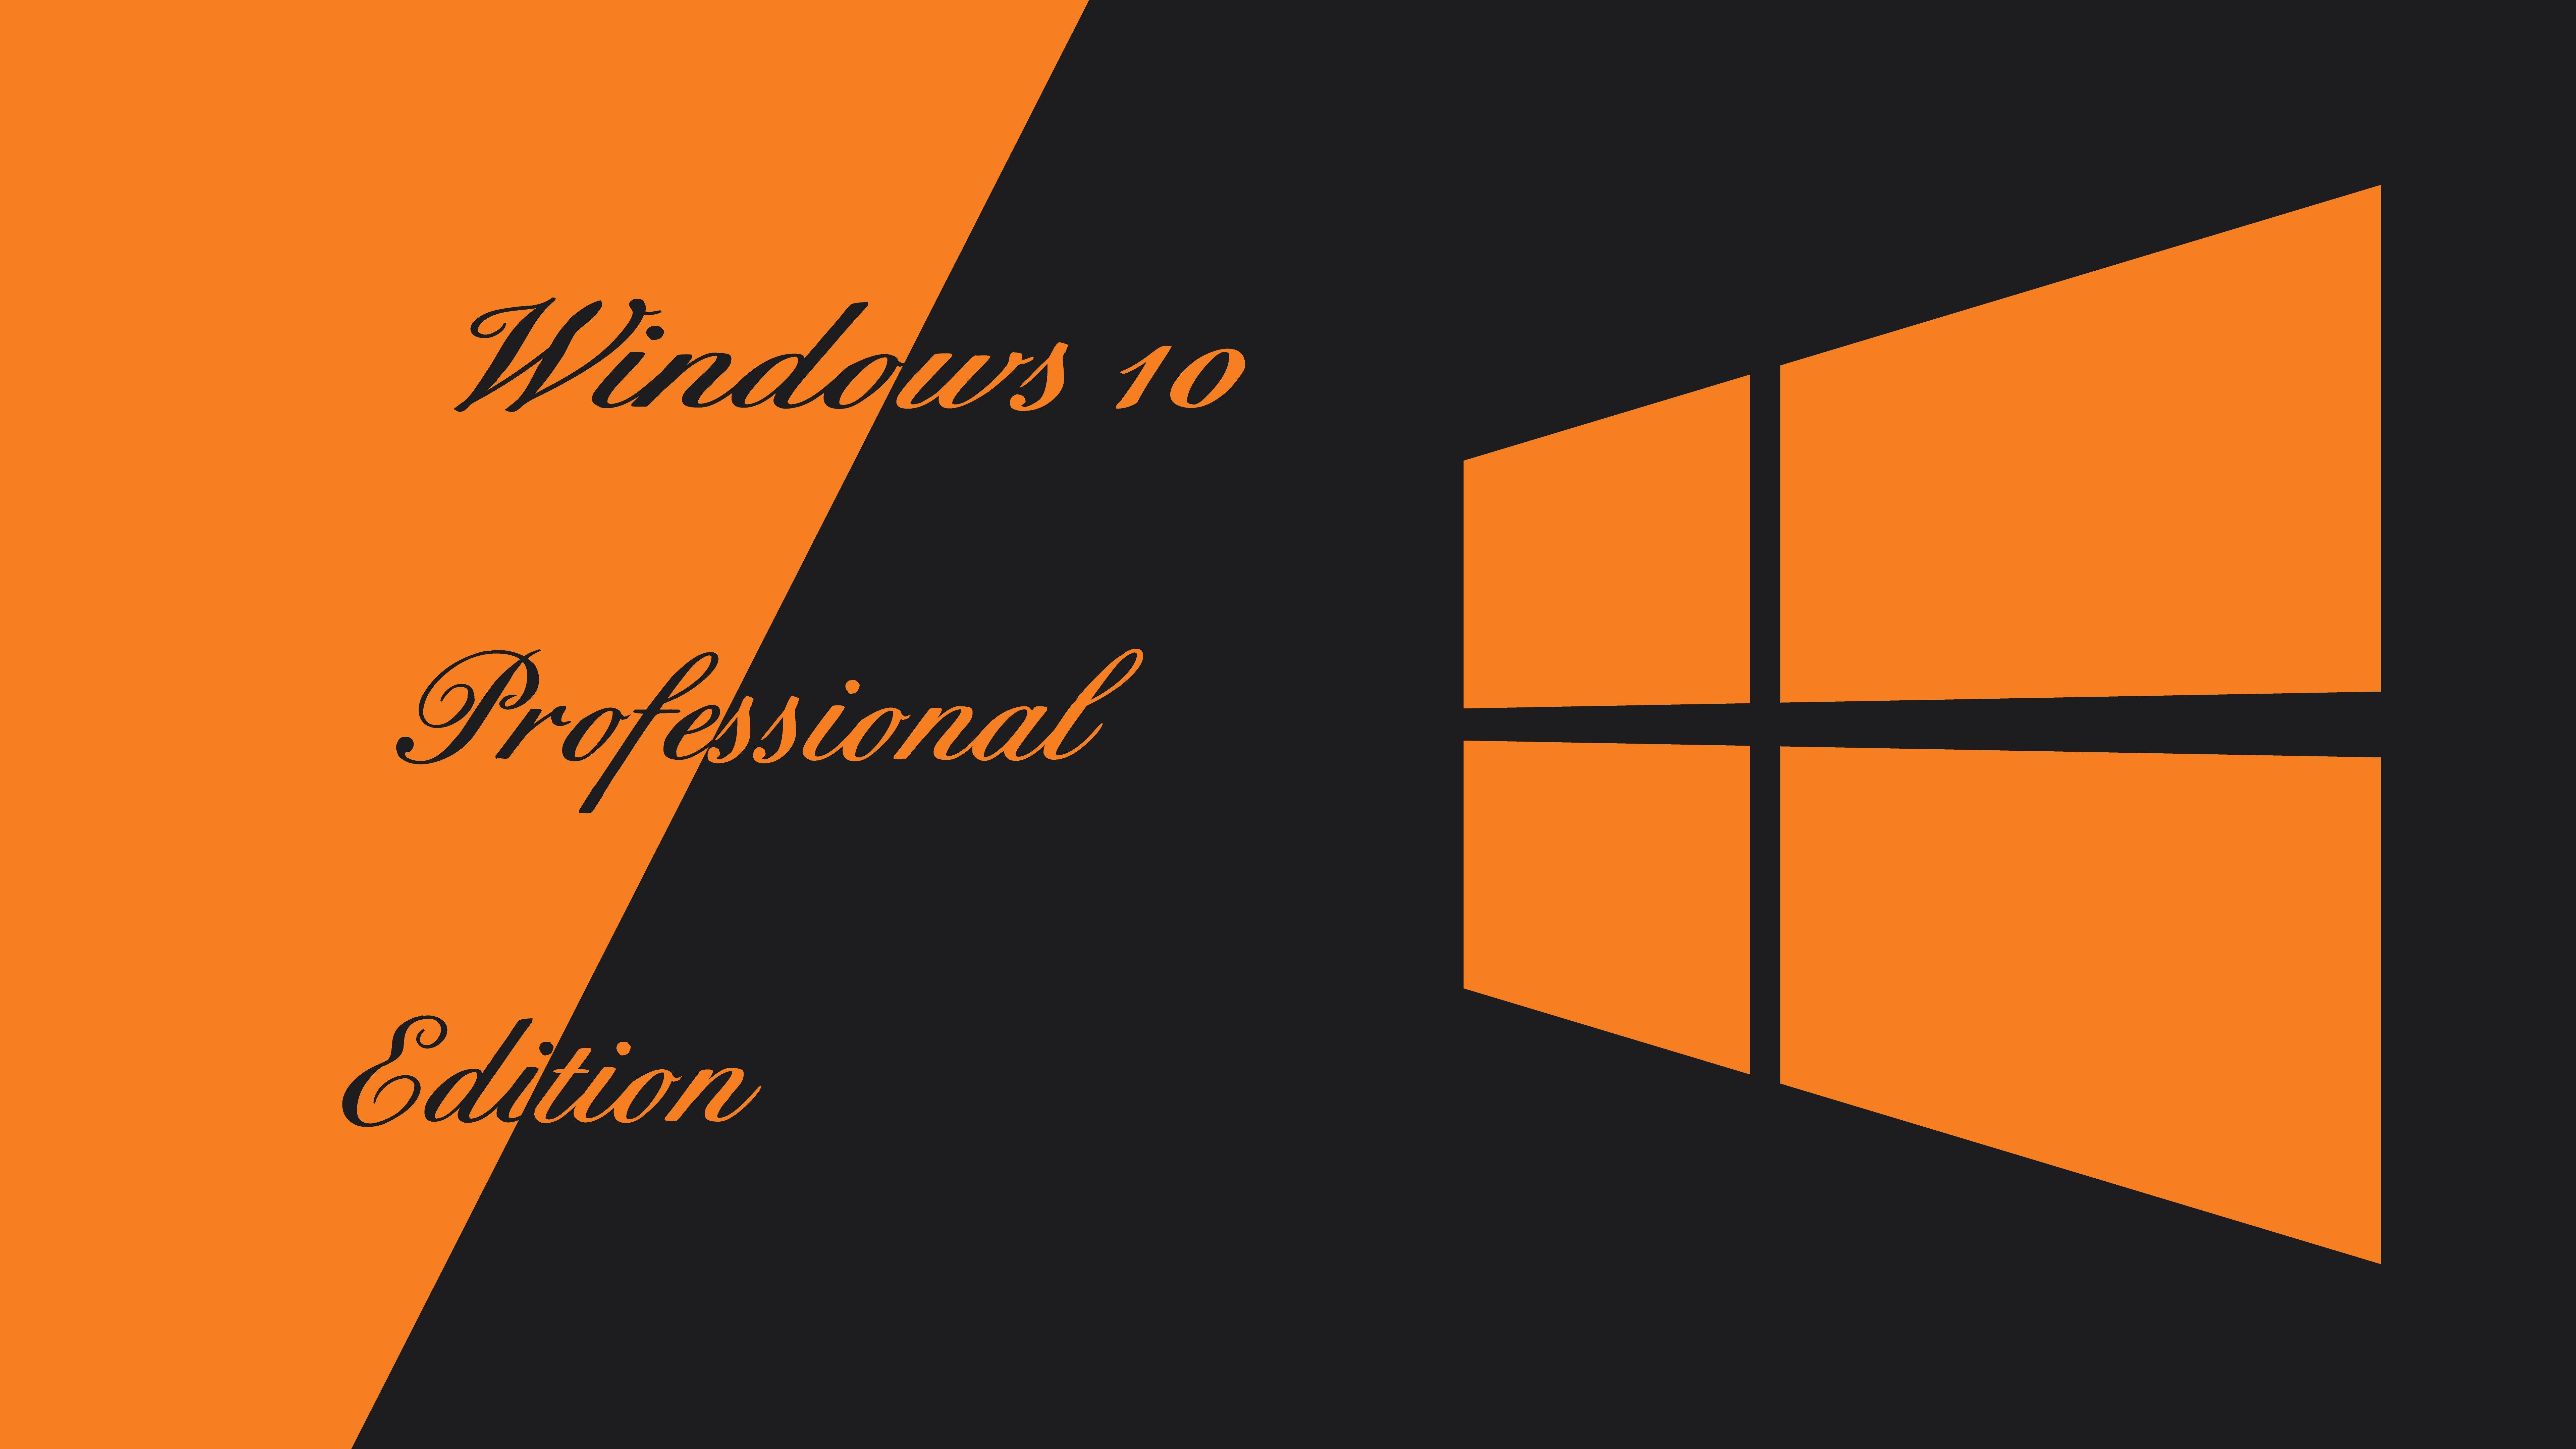 Windows 95 4k Wallpaper